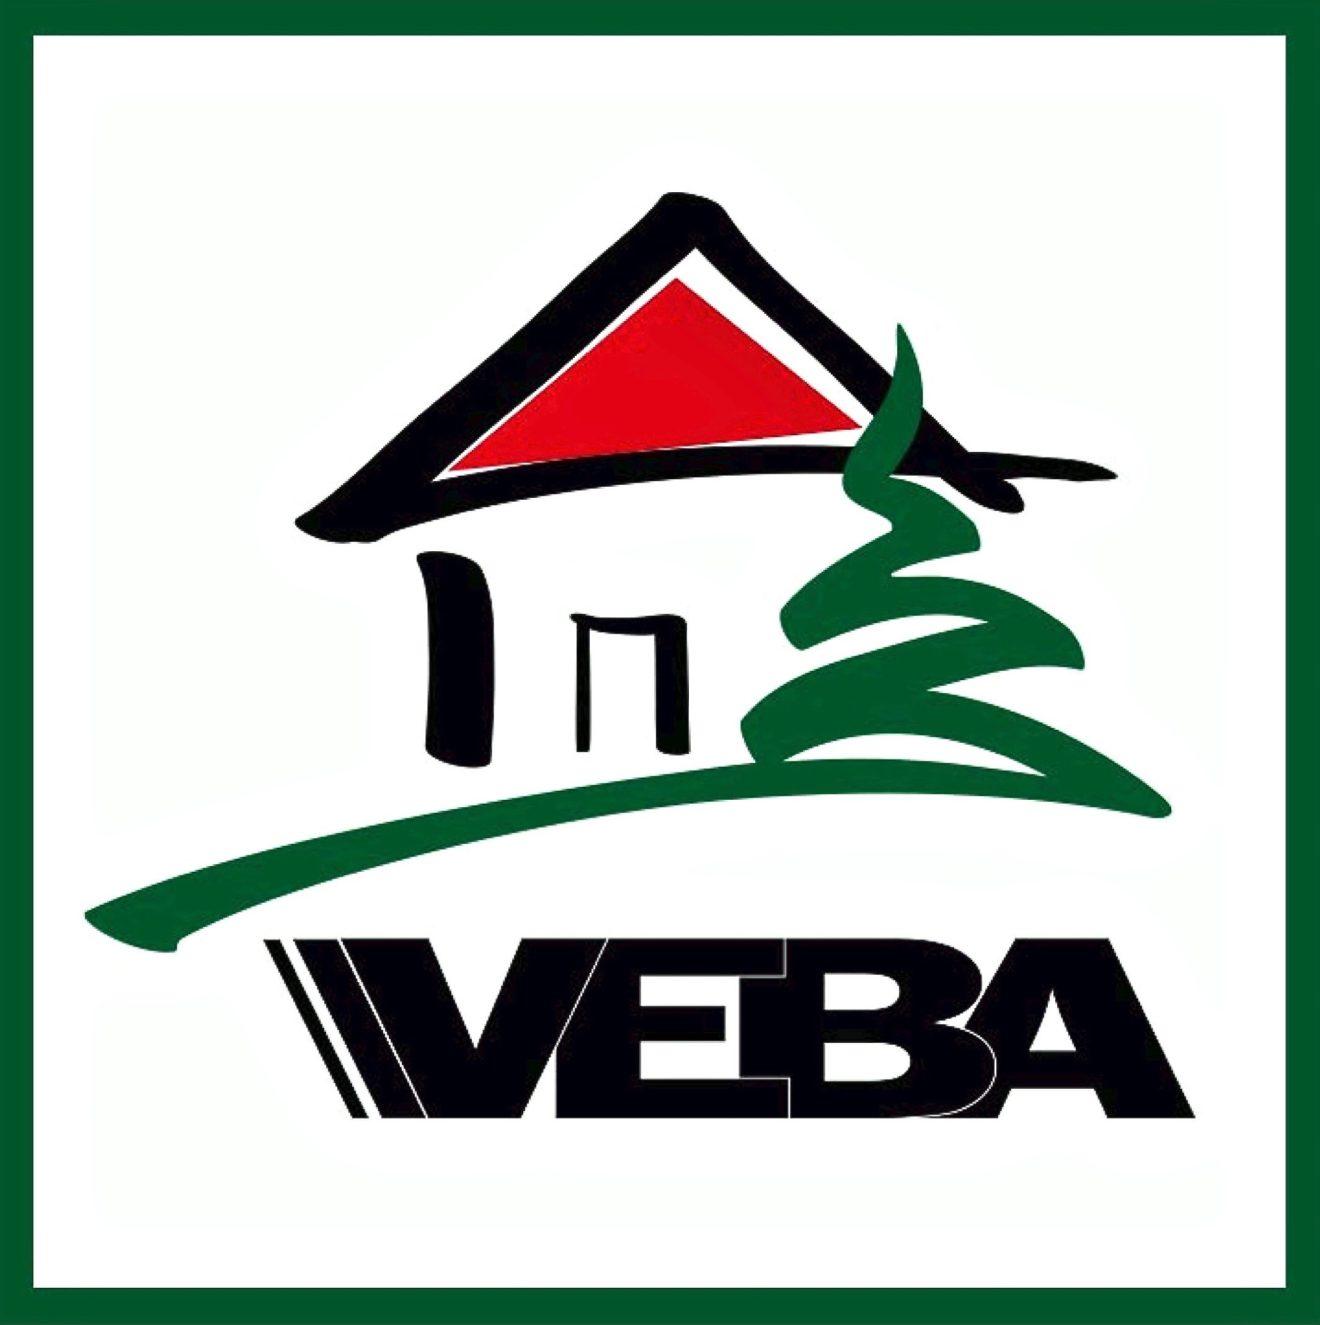 veba-gmbh 2